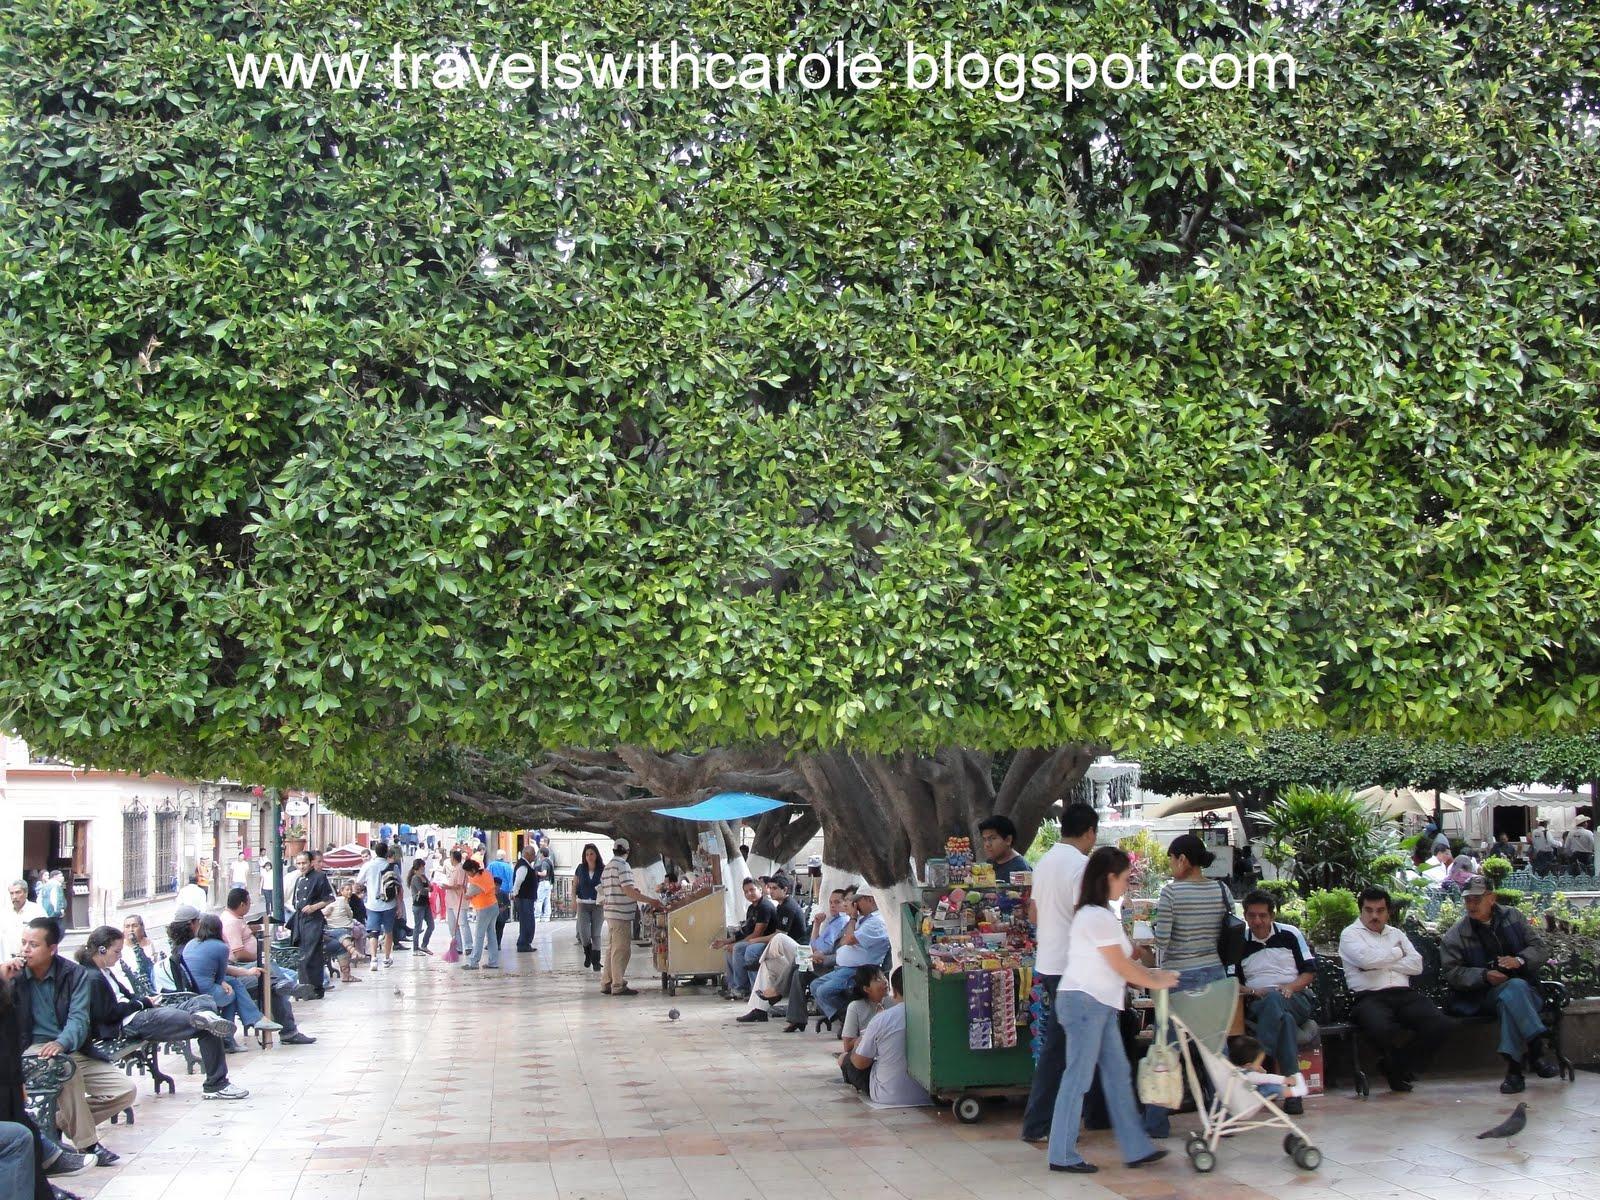 Travels With Carole: Sights to See: Jardin de la Union/Union Garden ...